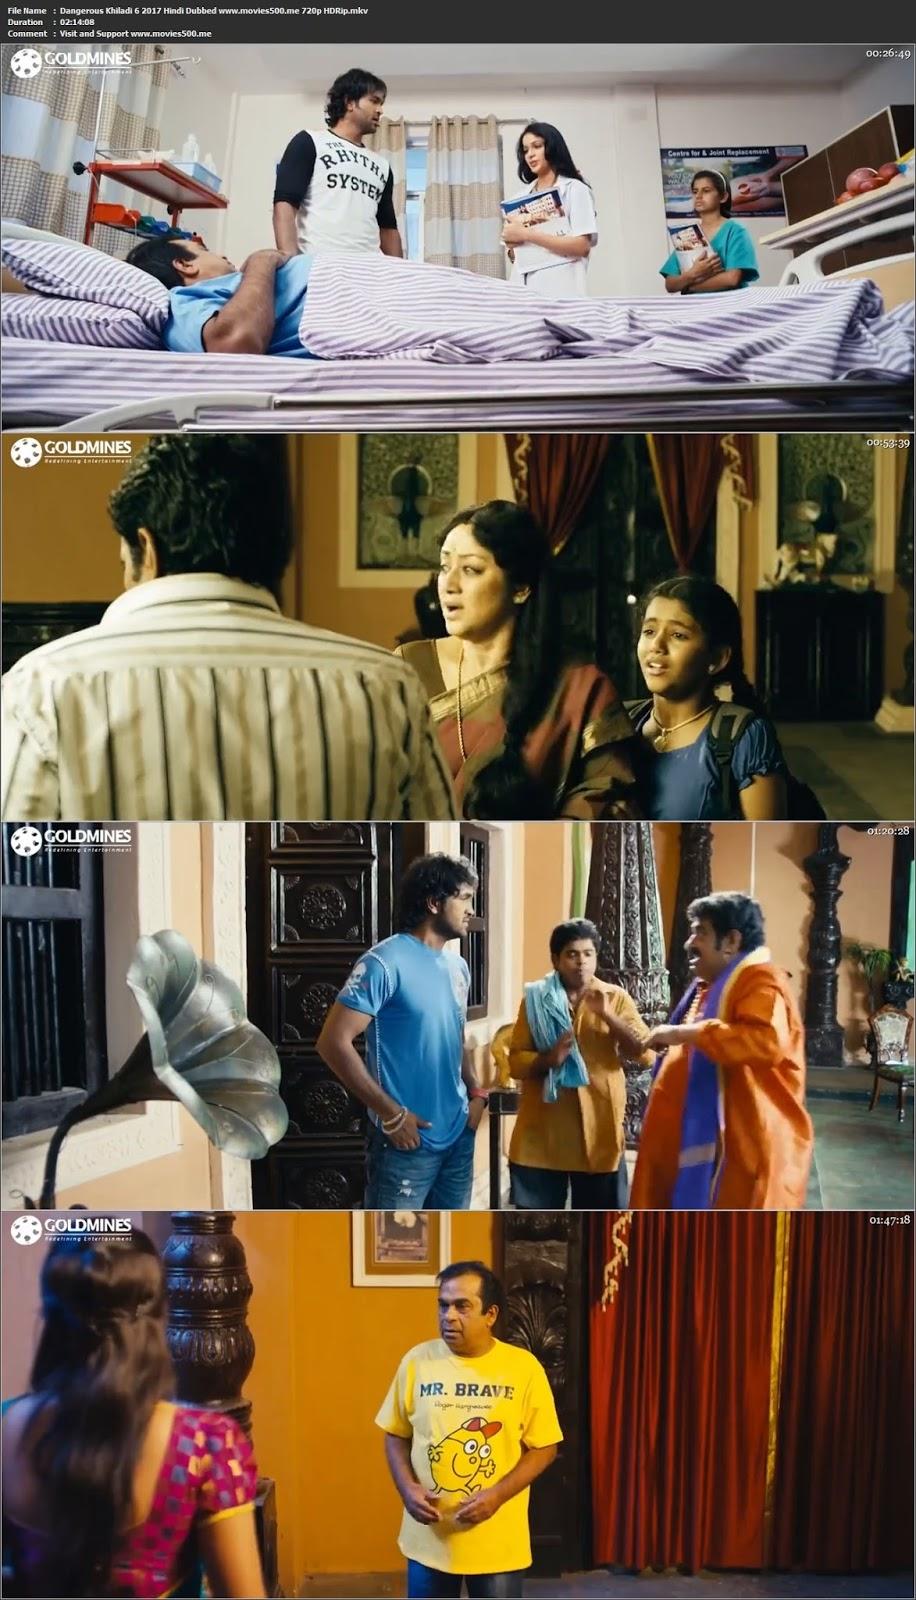 Dangerous Khiladi 6 2017 Hindi Dubbed Full Movie HDRip 720p at sweac.org